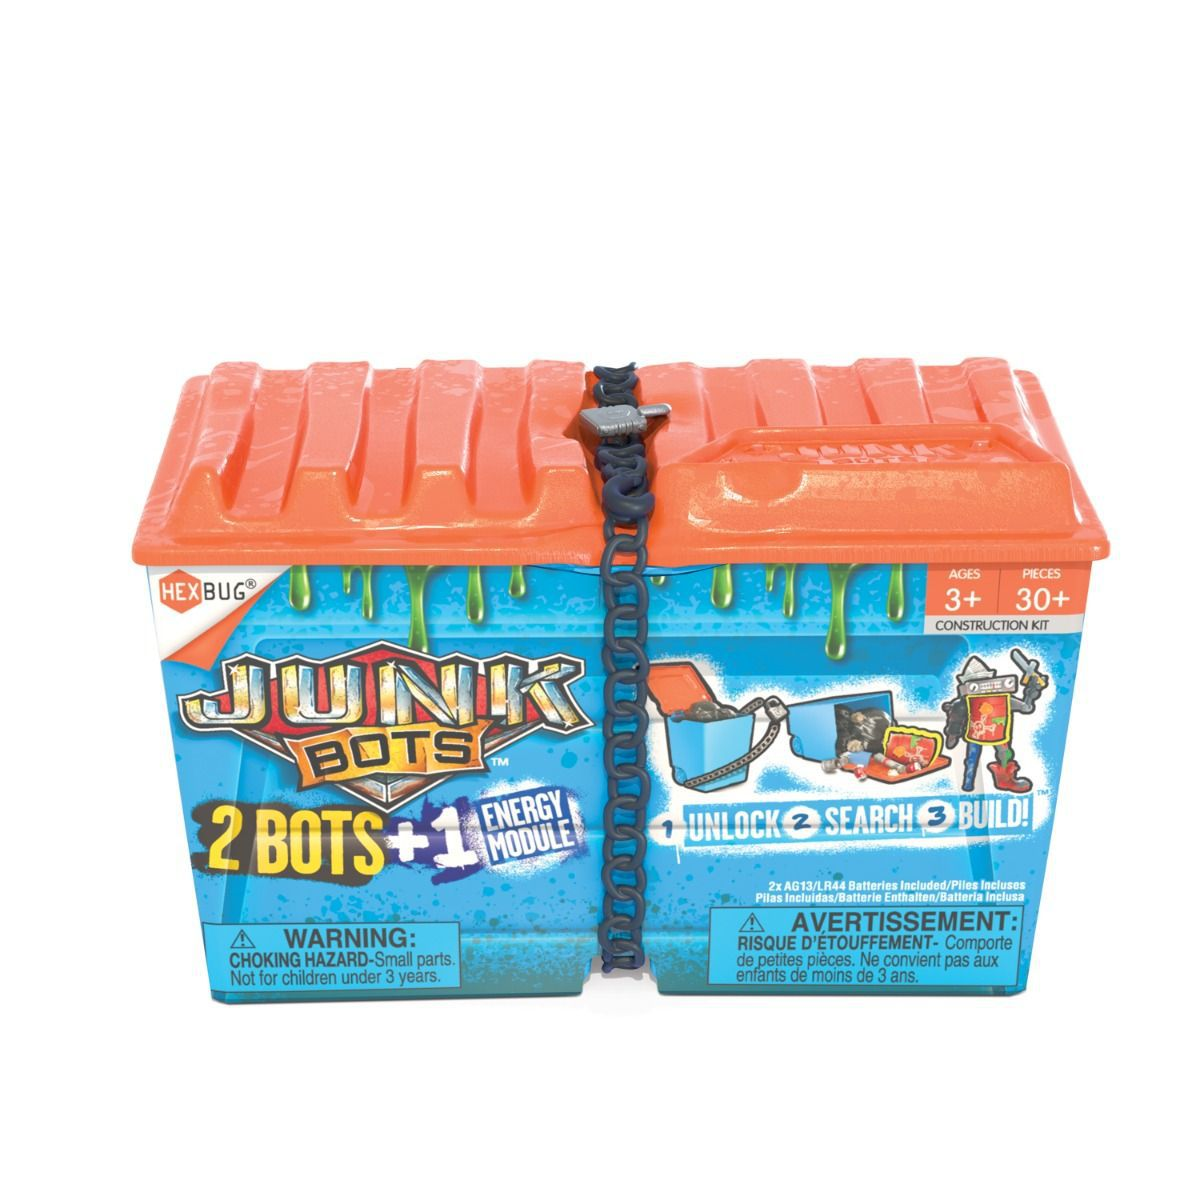 JUNKBOTS Dumpster Kit